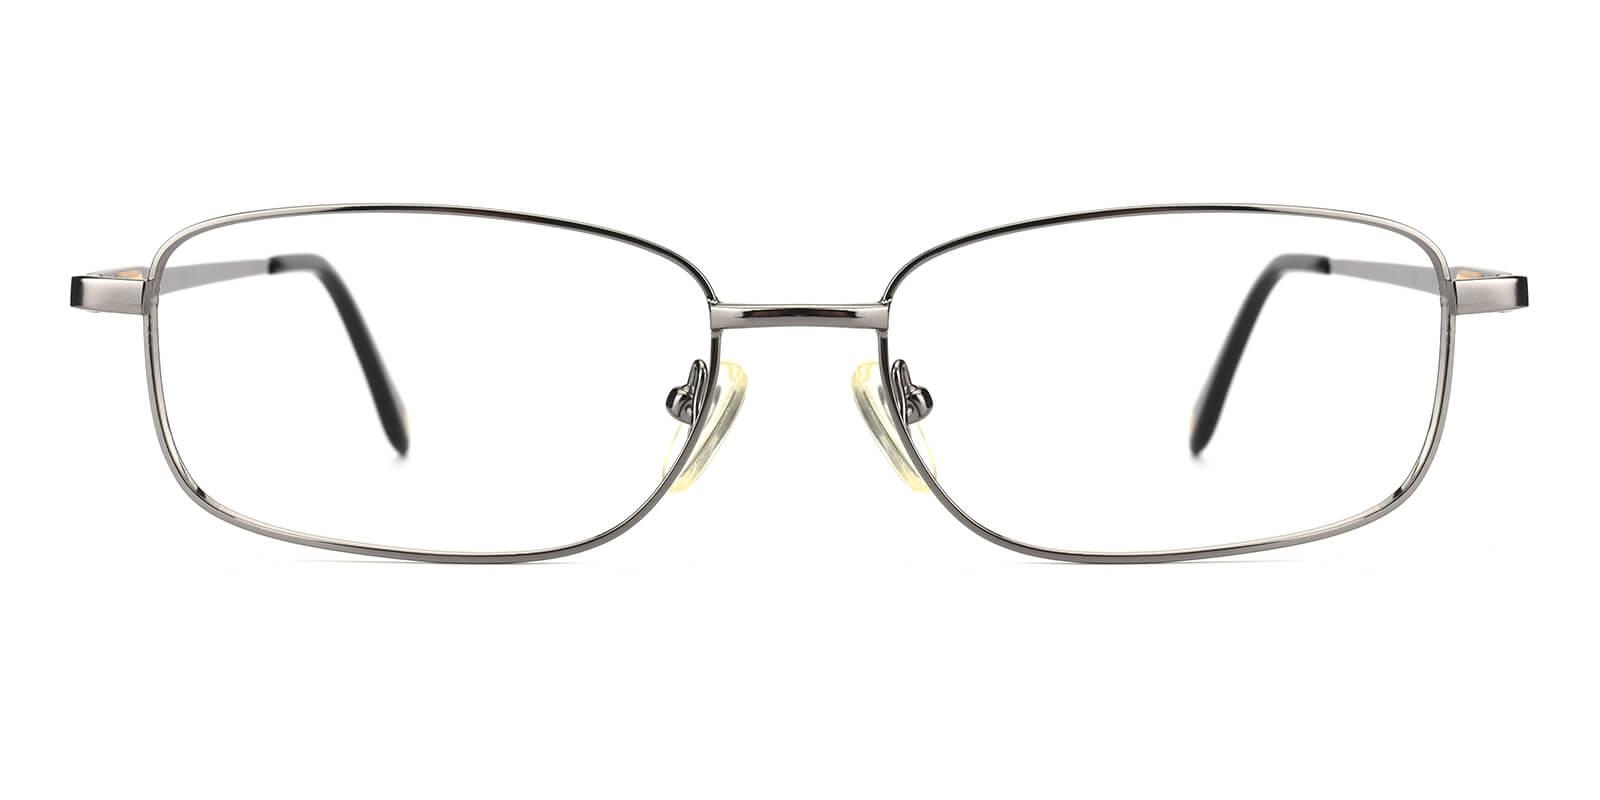 Michelly-Gun-Rectangle-Metal-Eyeglasses-additional2